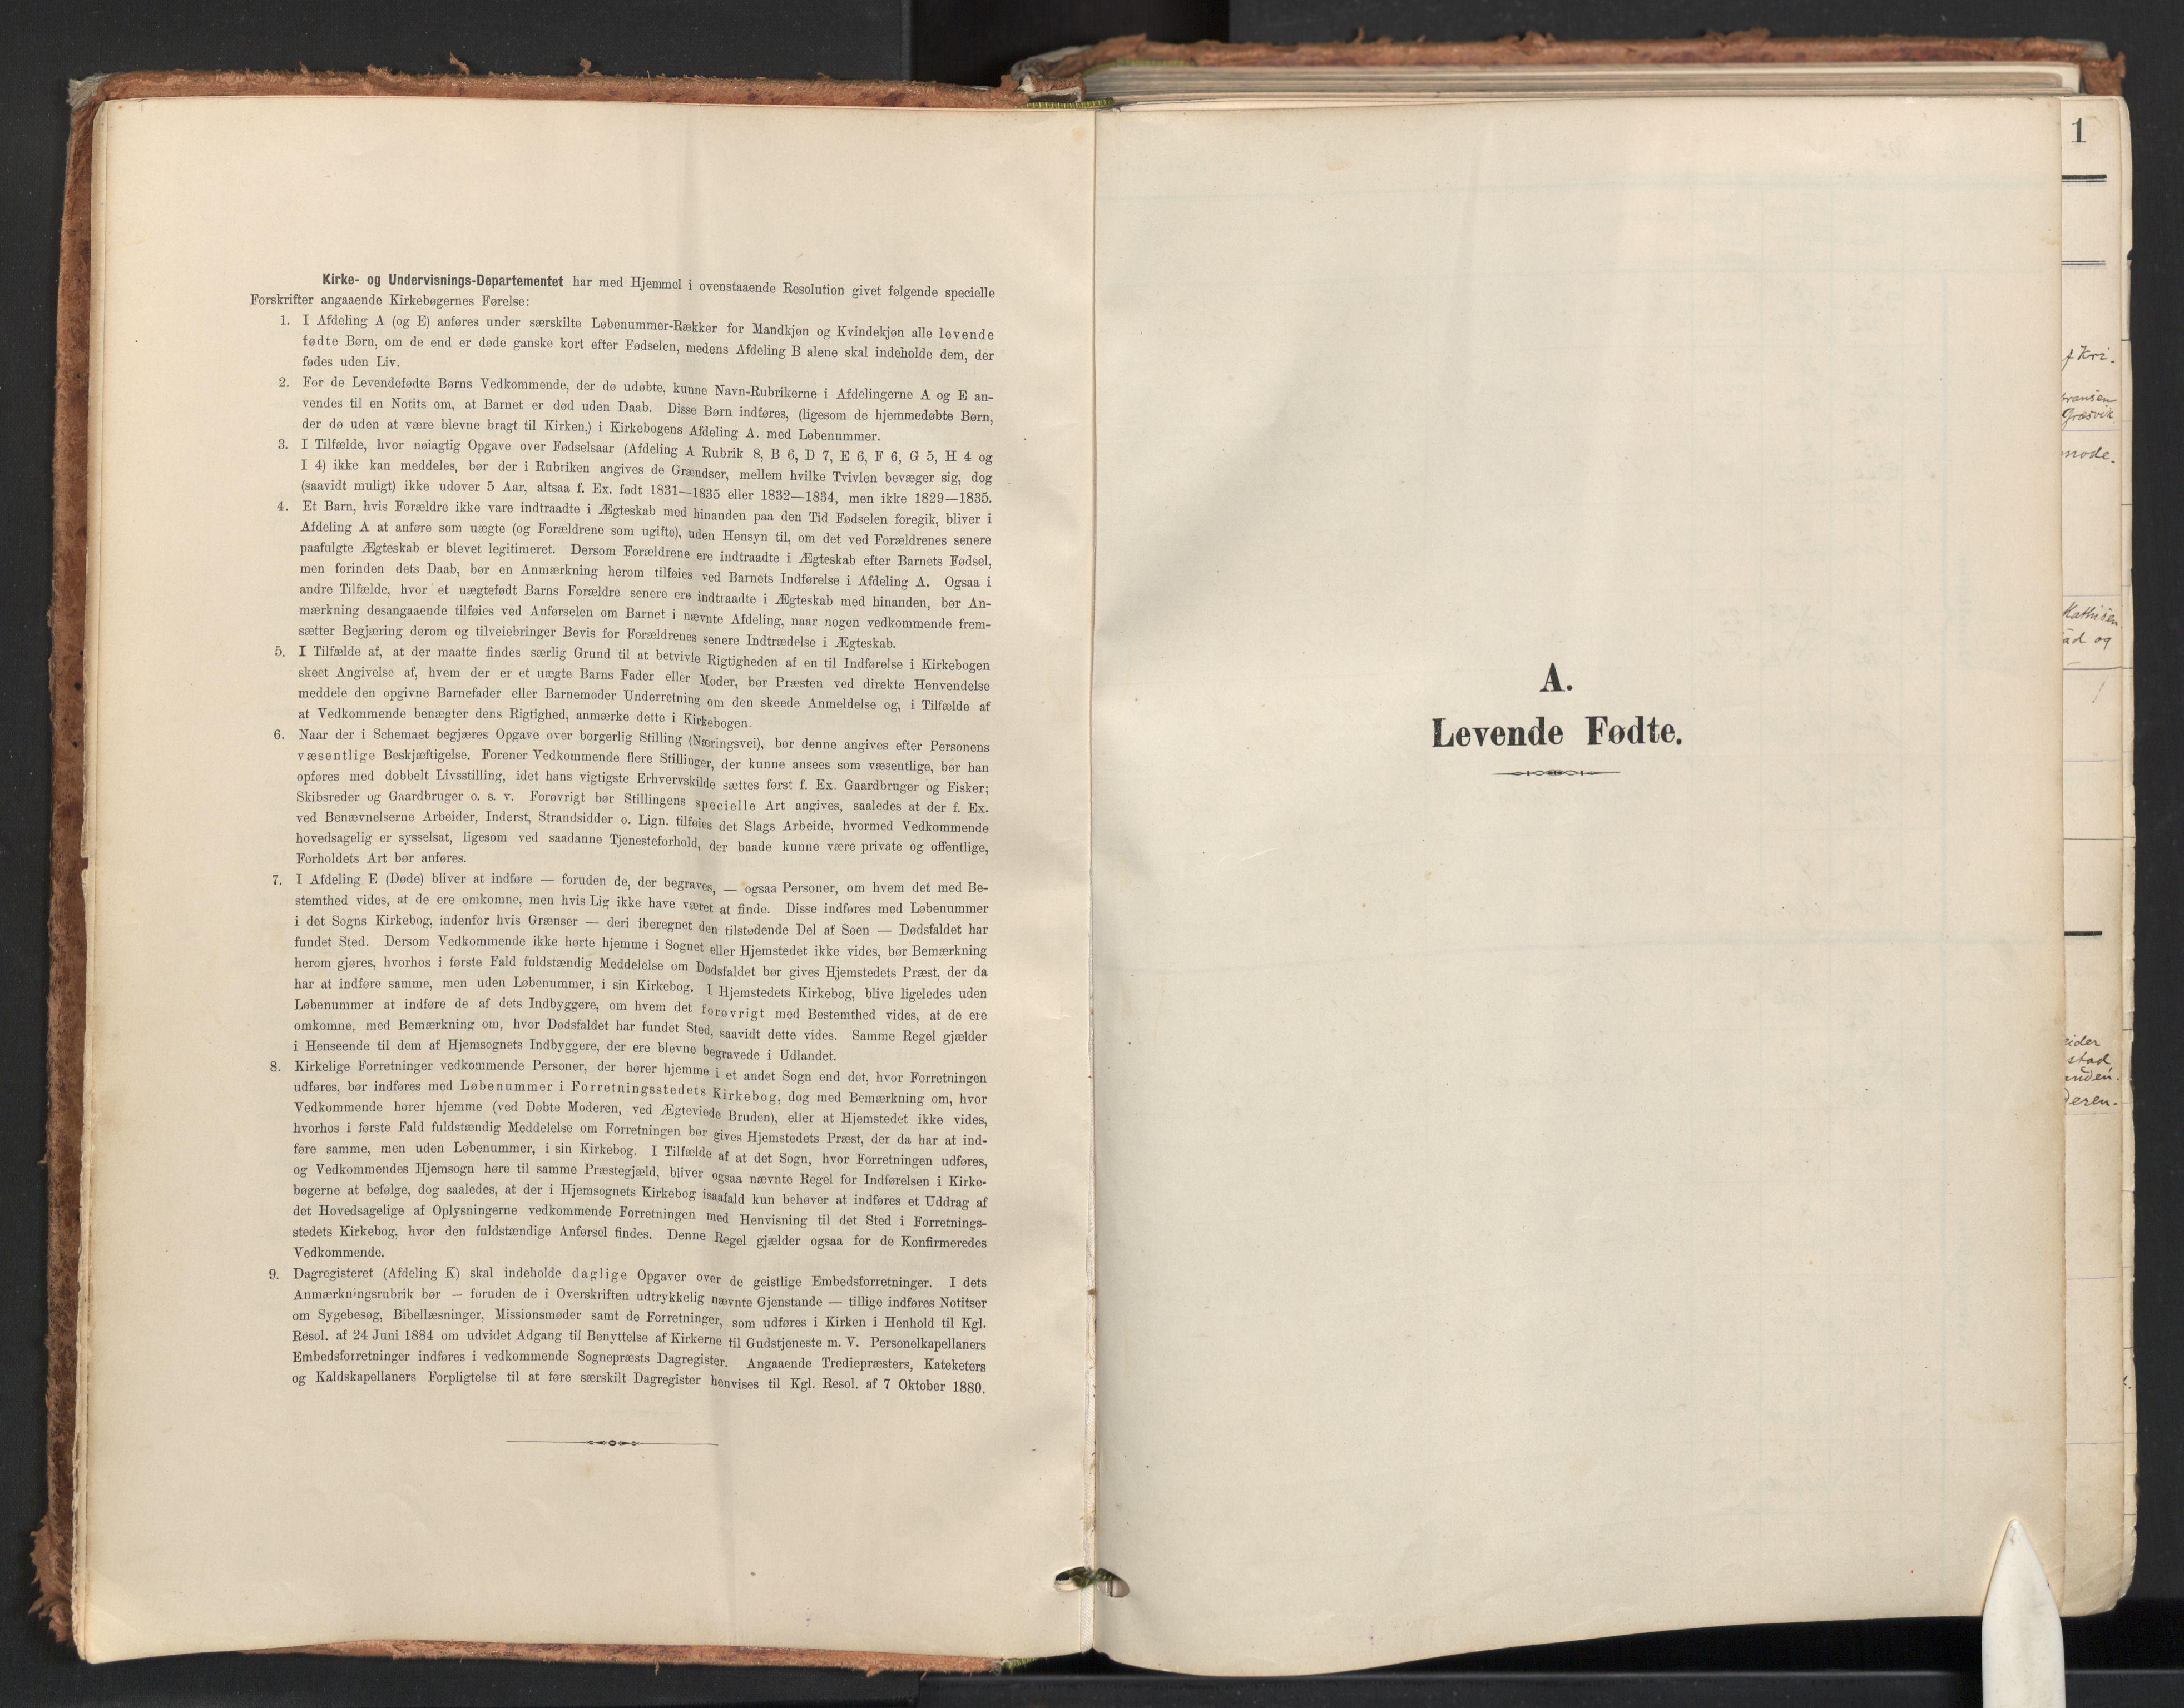 SAO, Råde prestekontor kirkebøker, F/Fa/L0008: Parish register (official) no. 8, 1903-1924